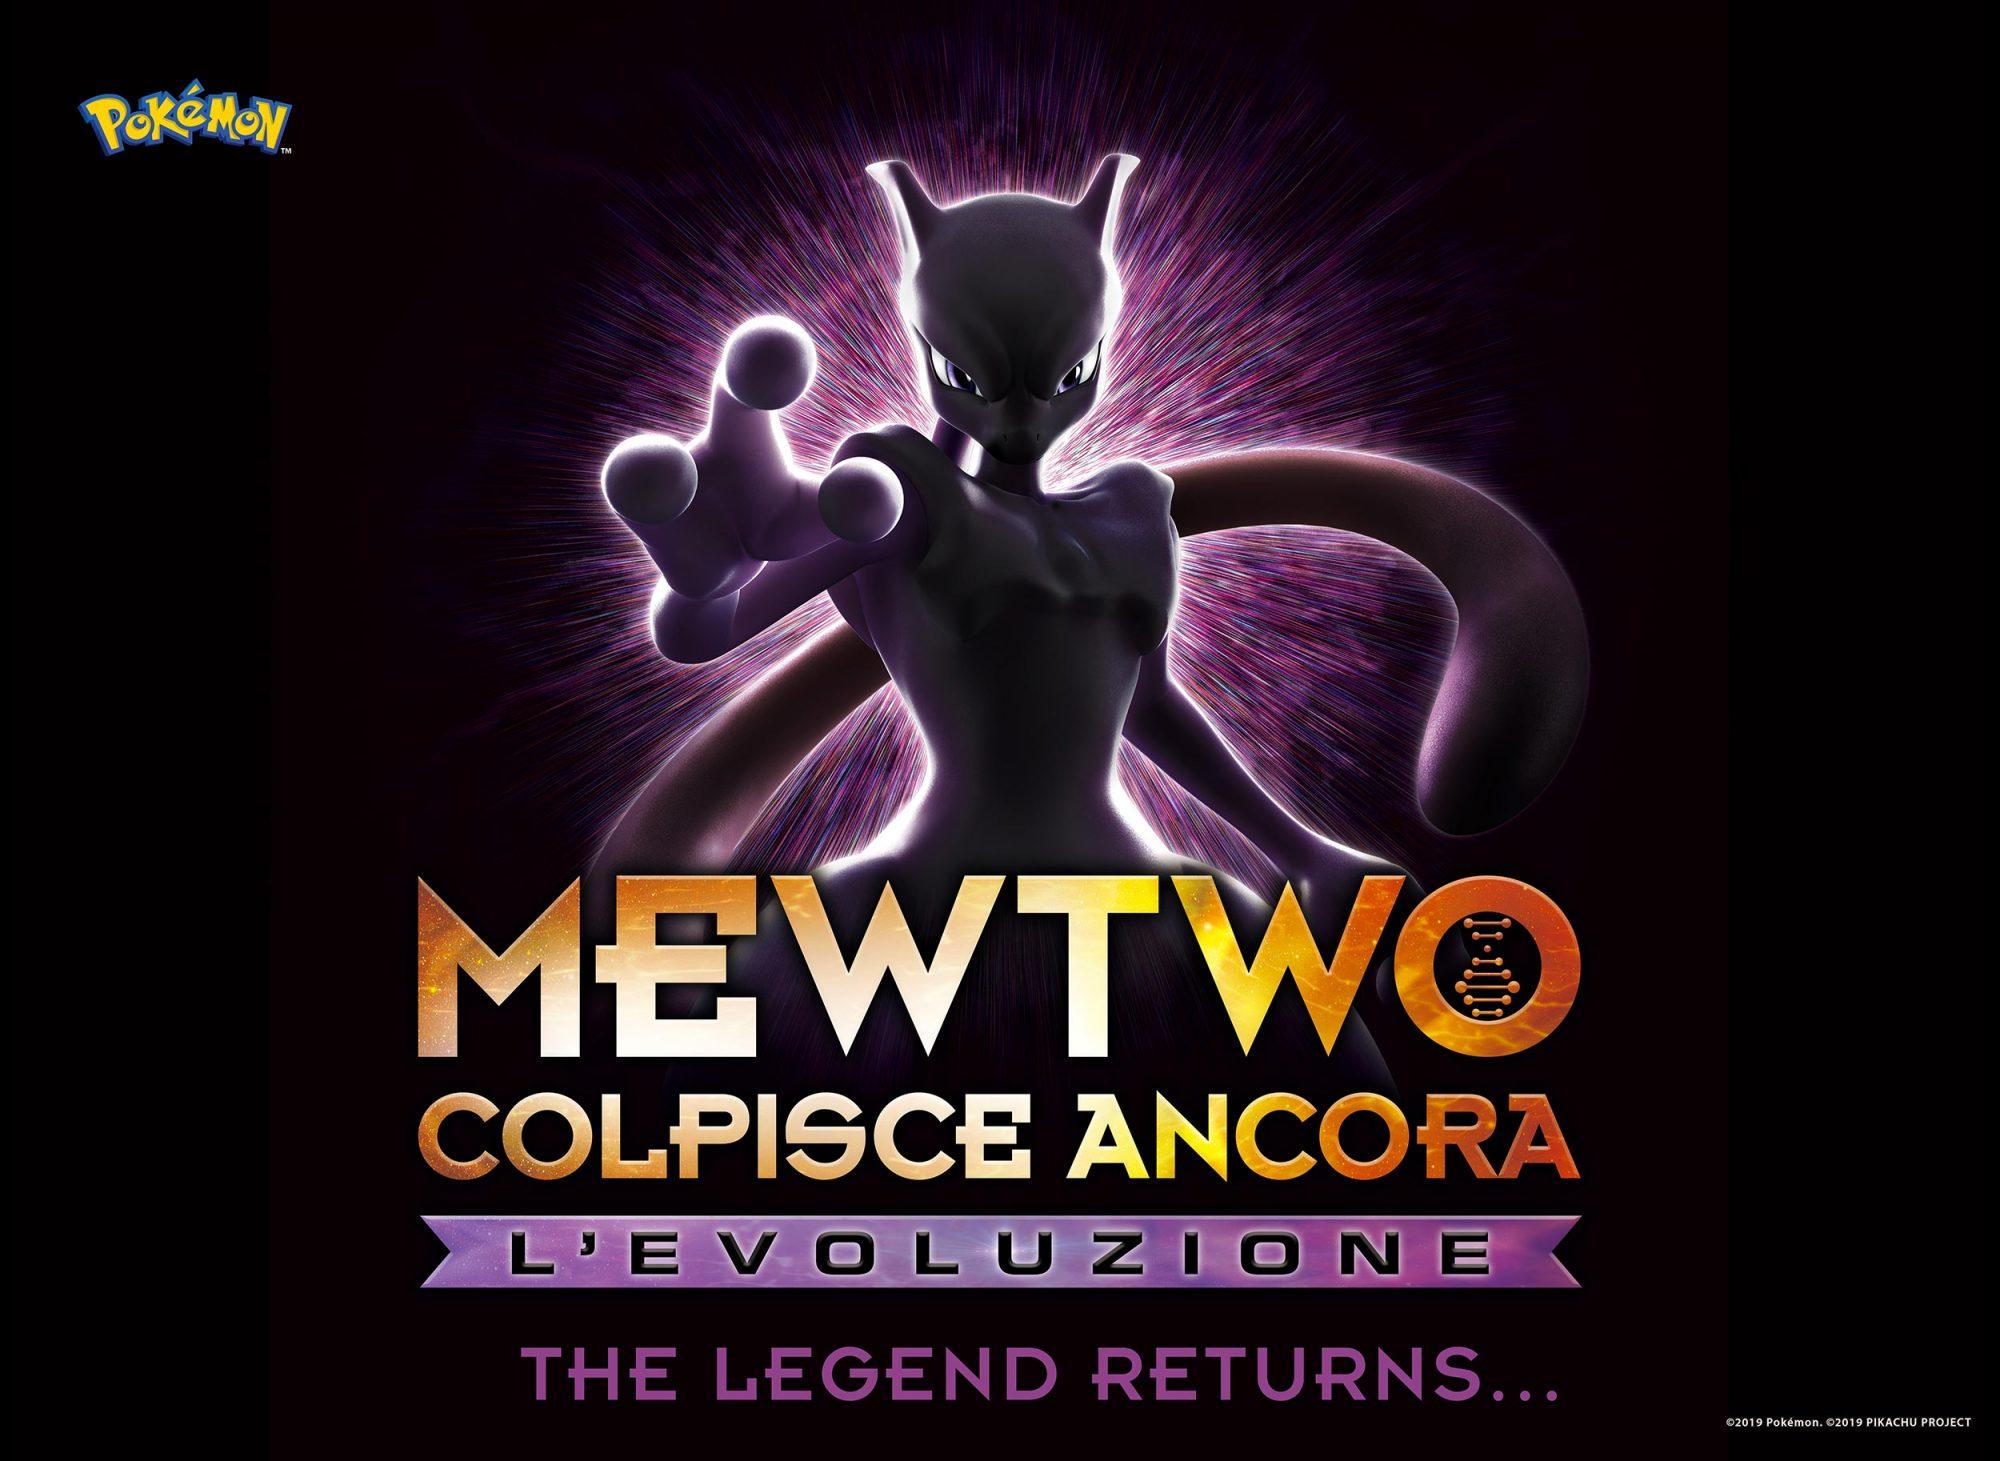 Il film Pokémon Mewtwo colpisce ancora - L'evoluzione arriva su Netflix